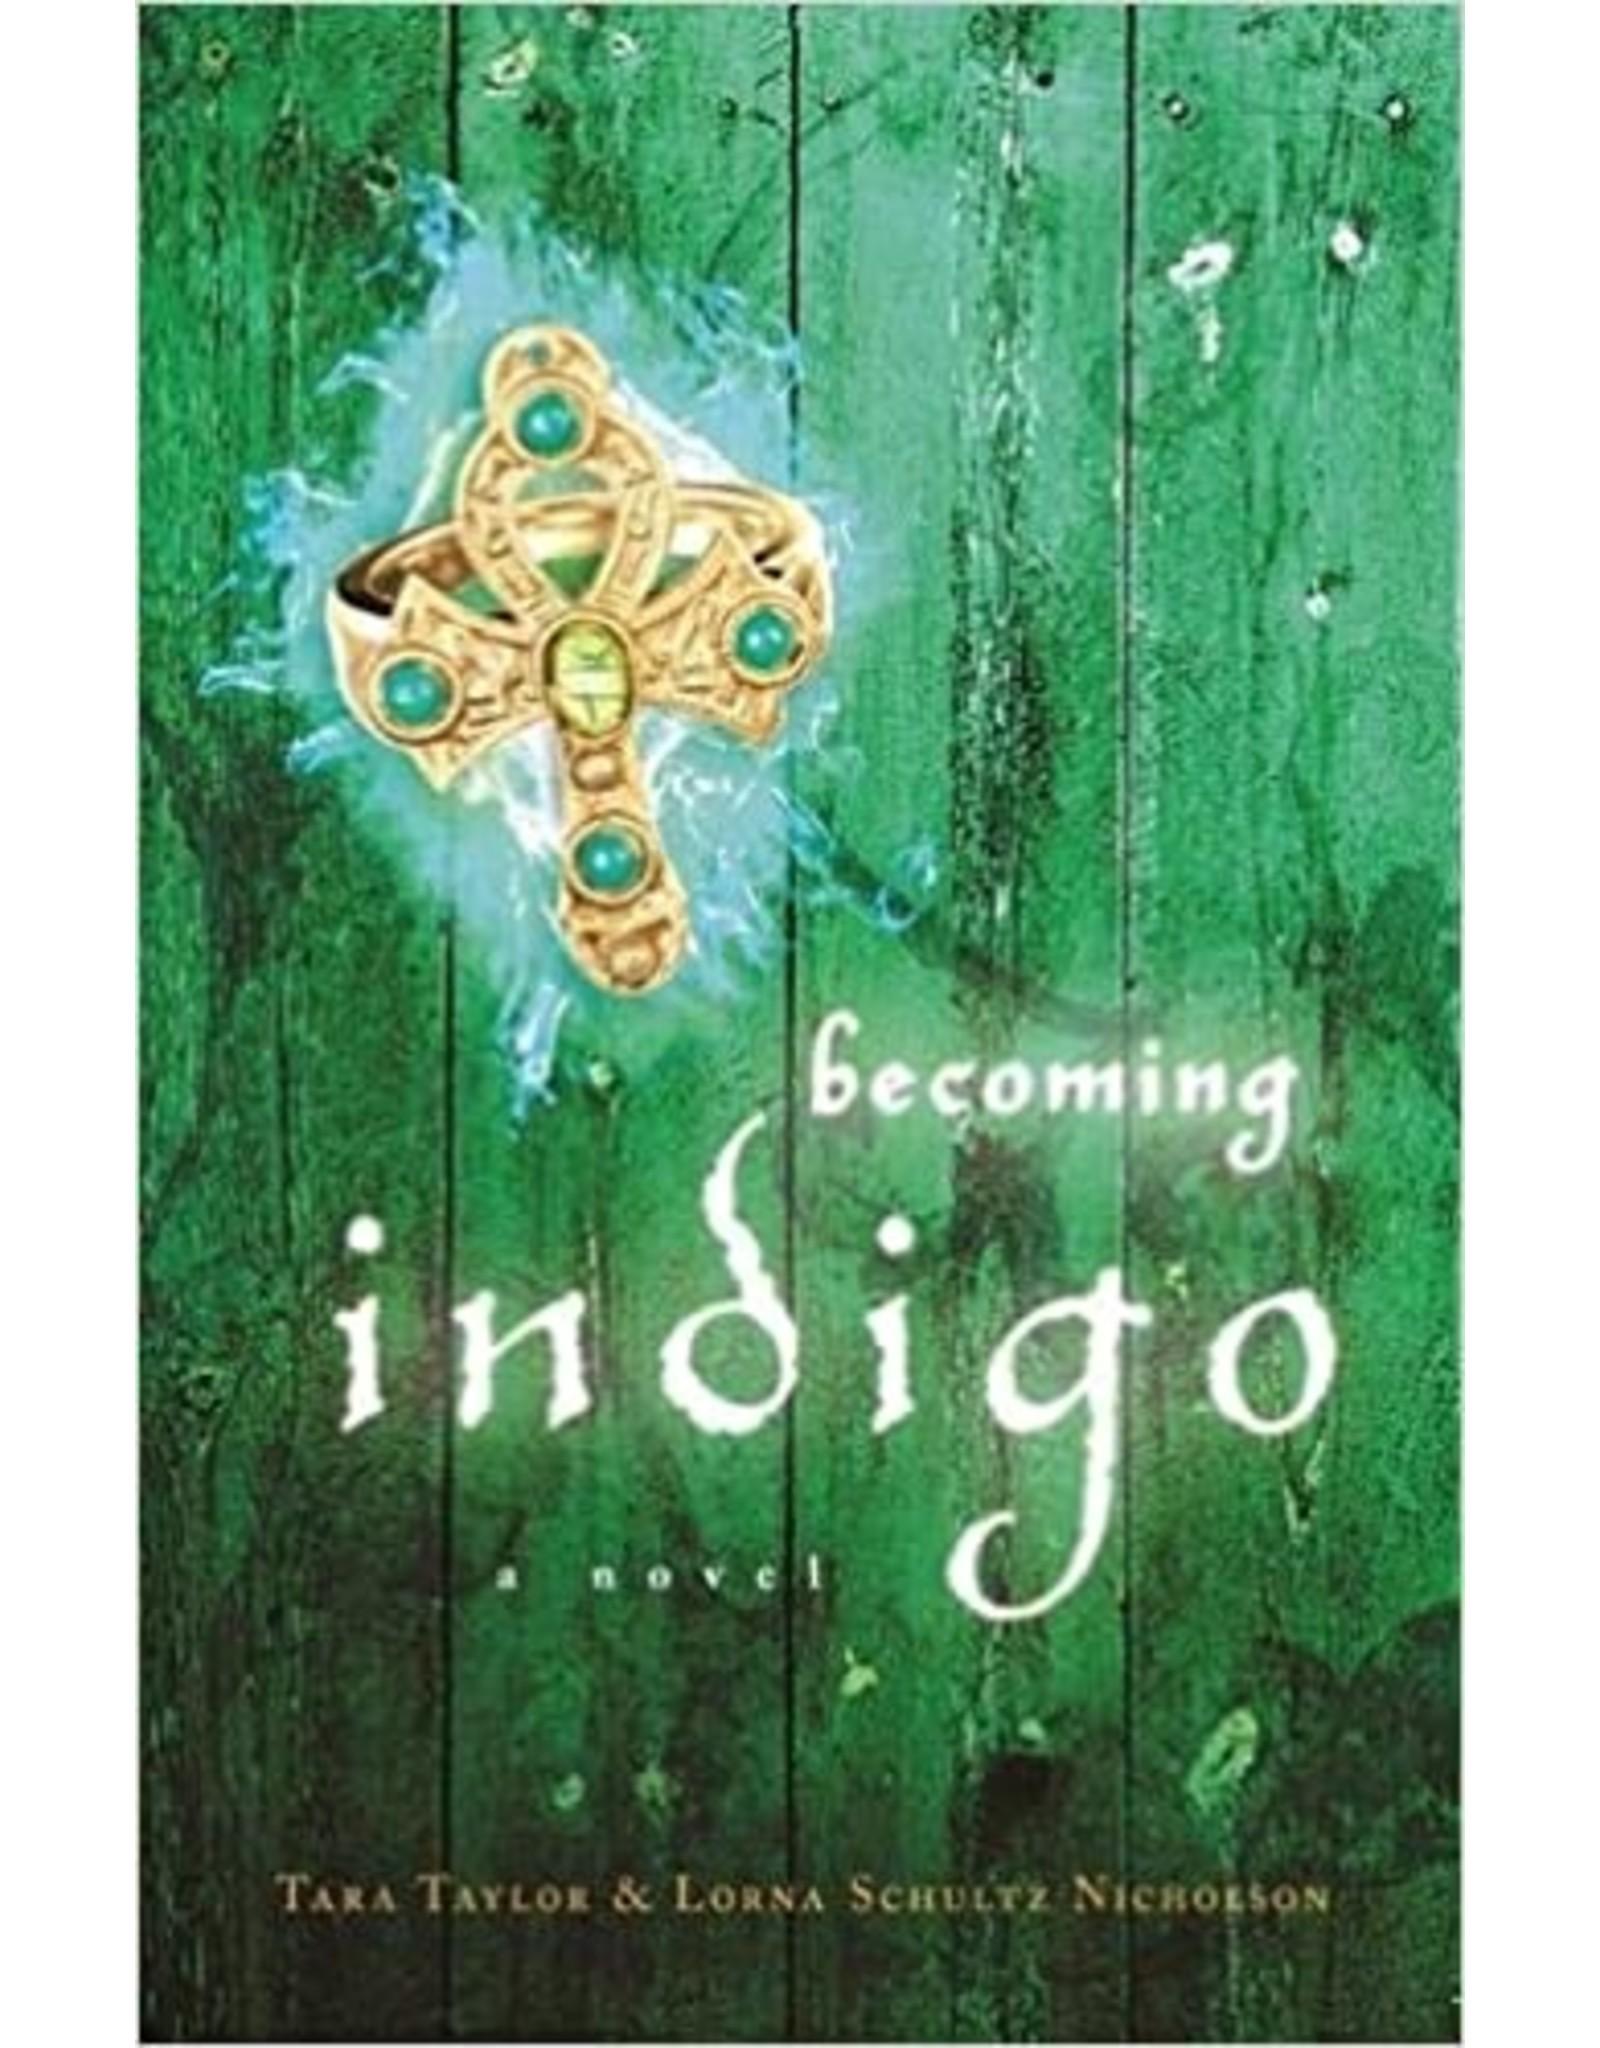 Becoming Indigo